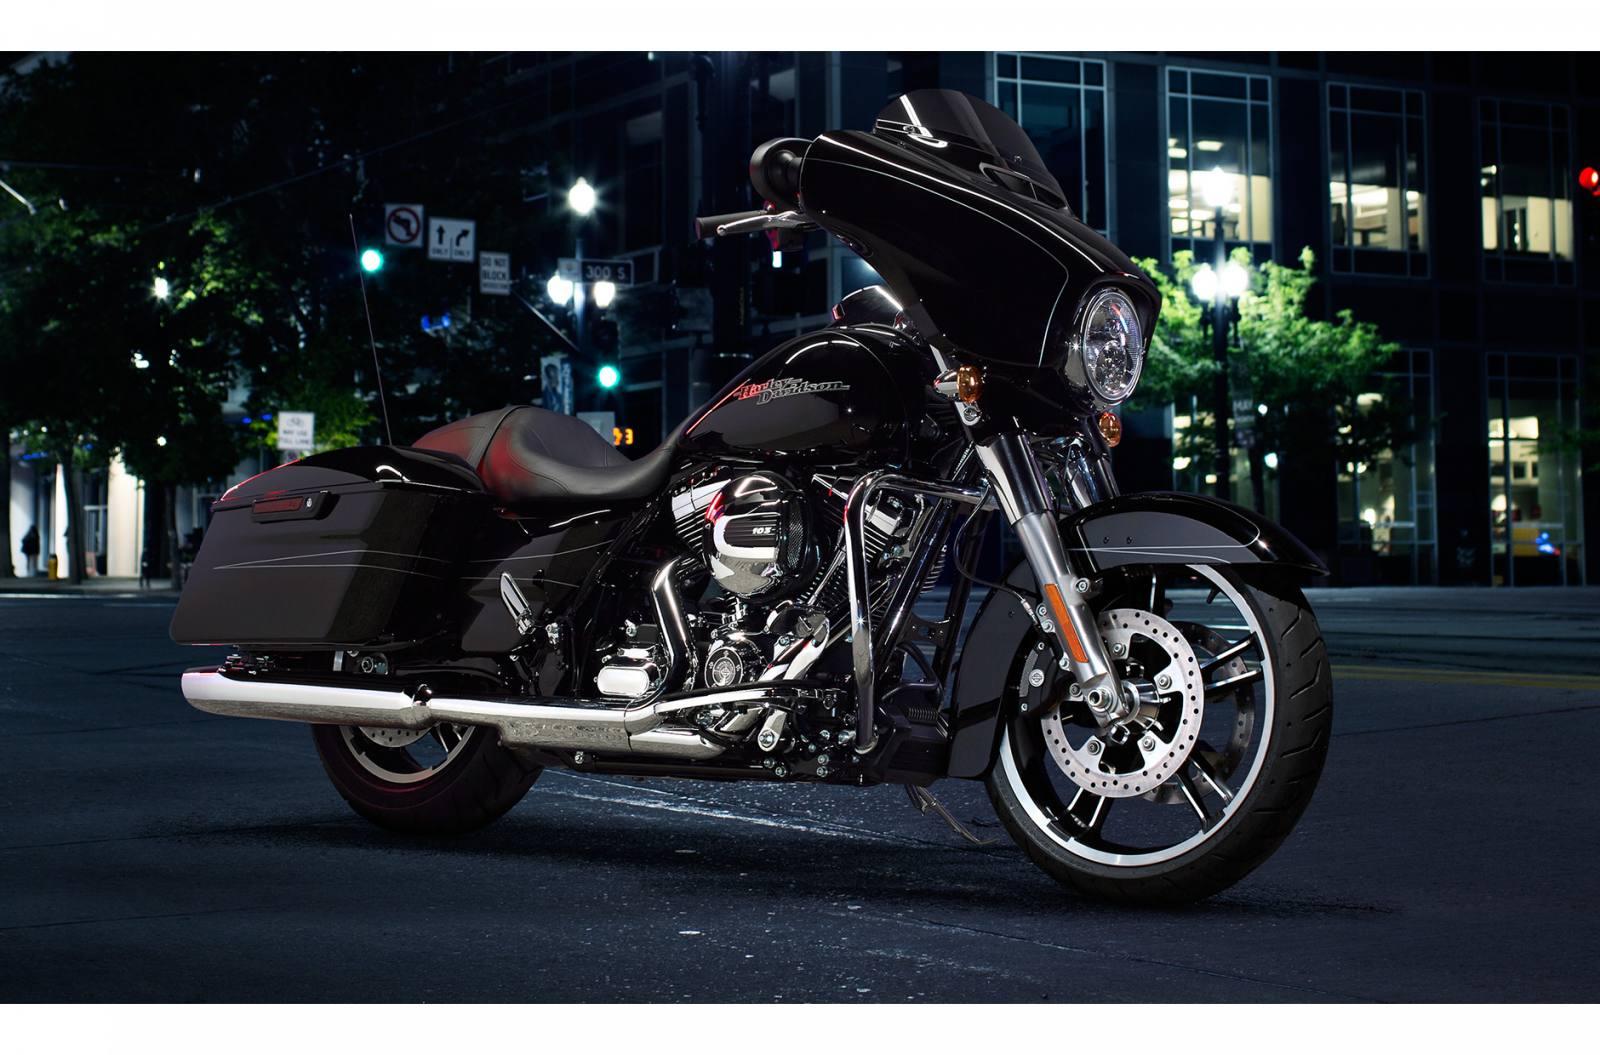 2015 Harley Davidson Flhxs Street Glide Special W Tire Shredder